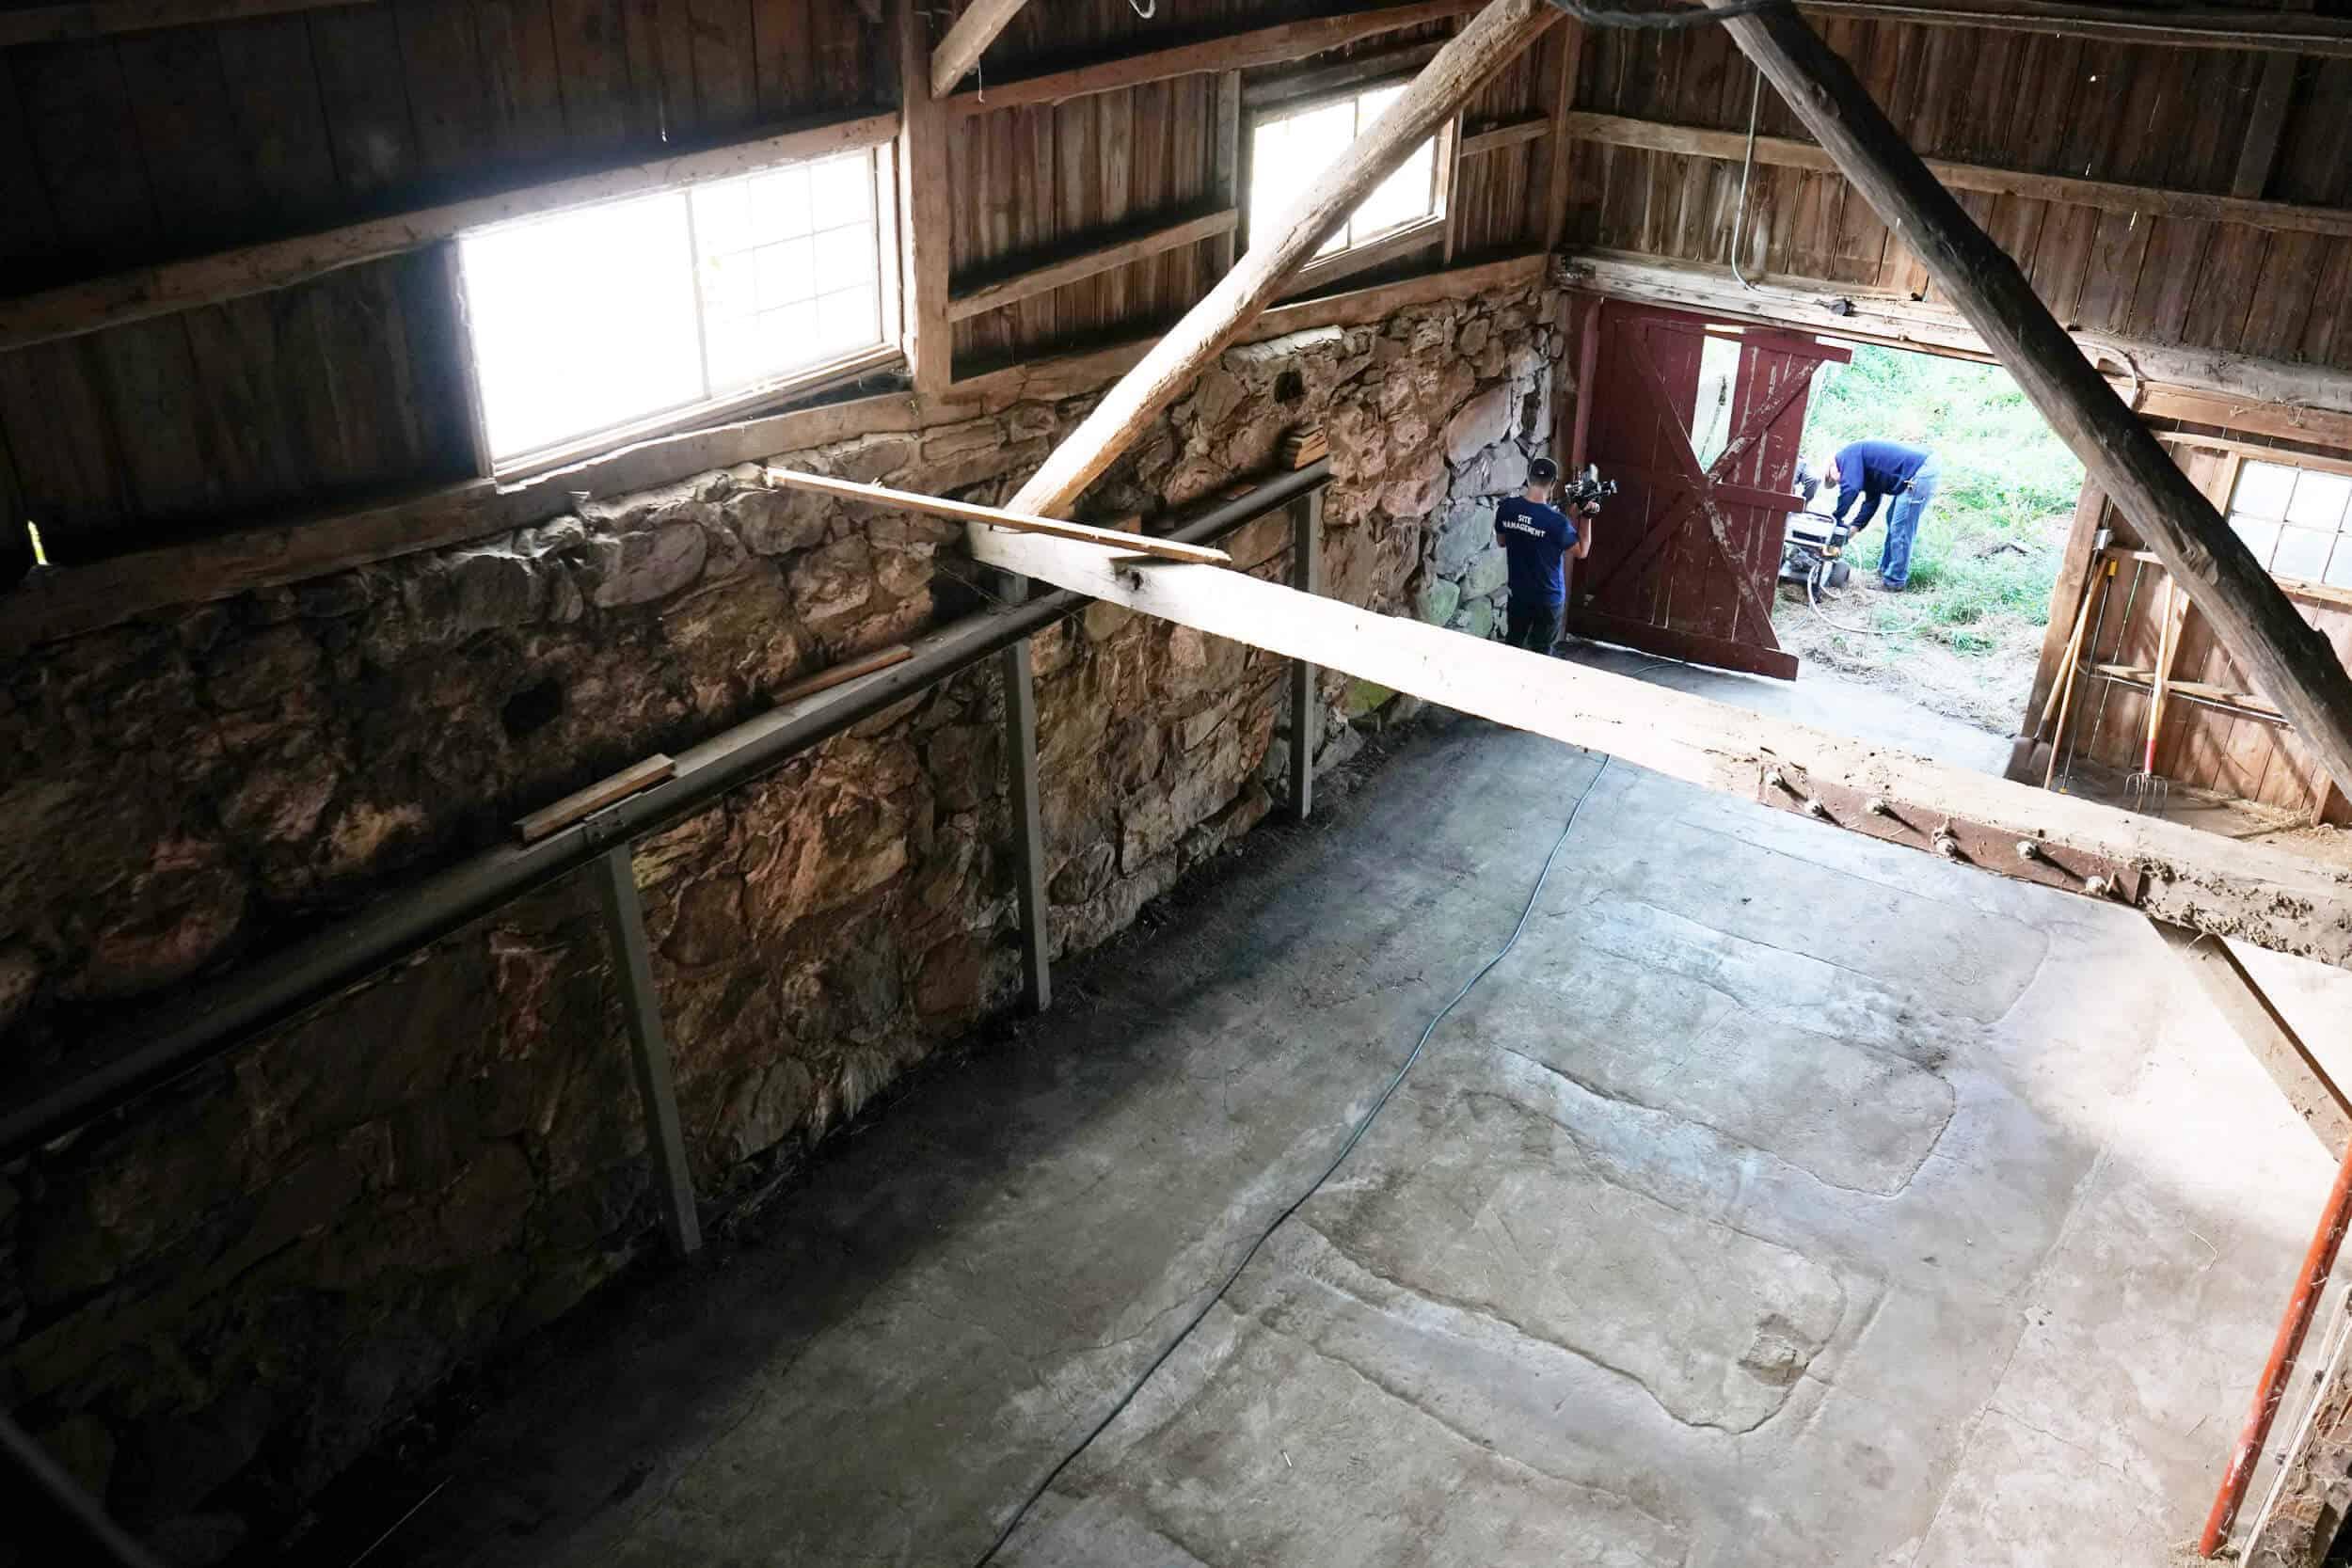 Emily Henderson Samsung The Frame Louise Roe The Barn 34